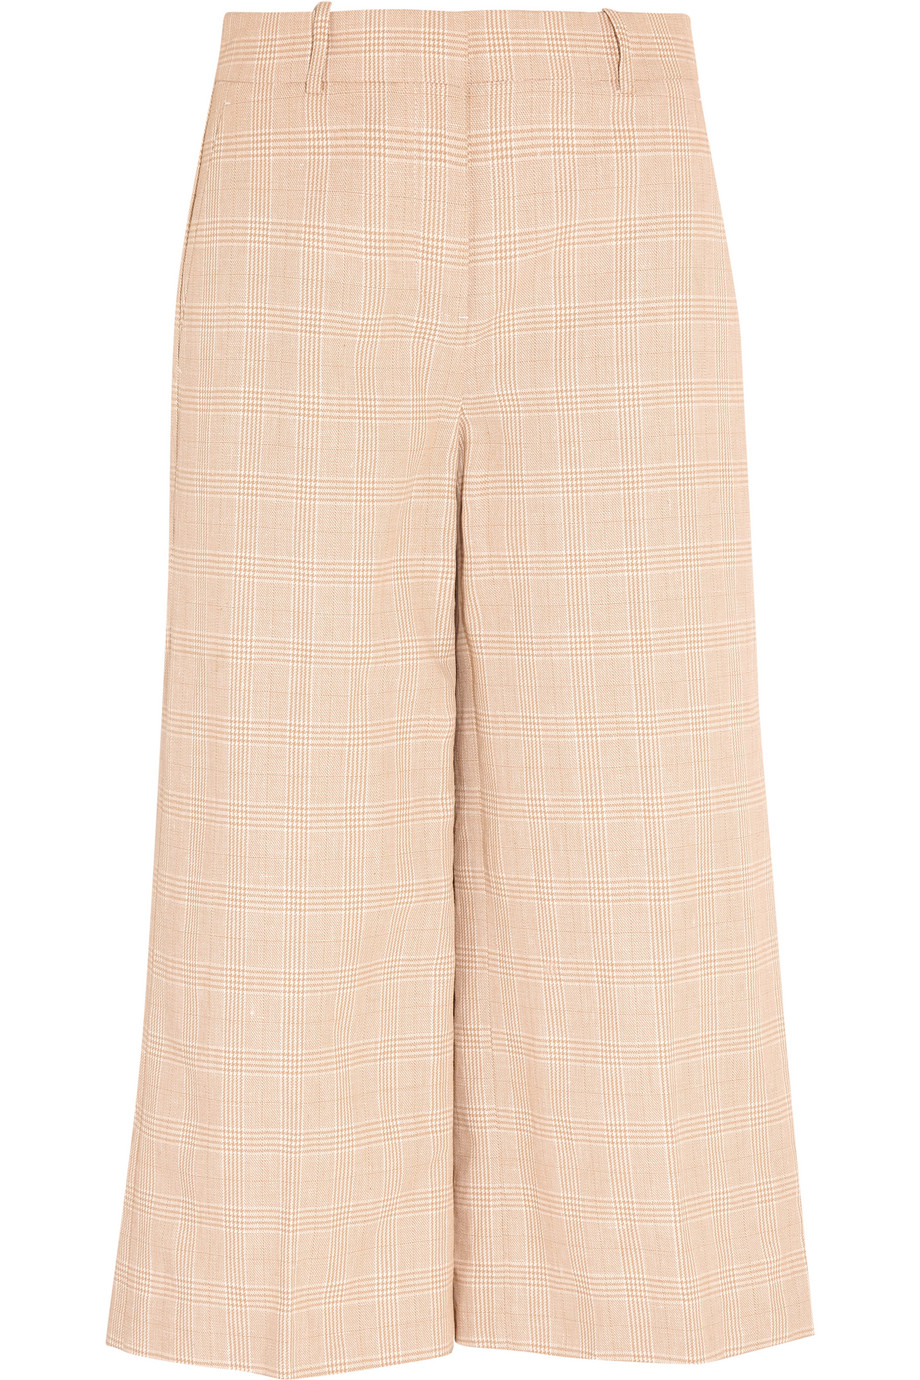 J.Crew Collection Plaid Linen and Cotton-Blend Culottes, Off-White, Women's, Size: 10